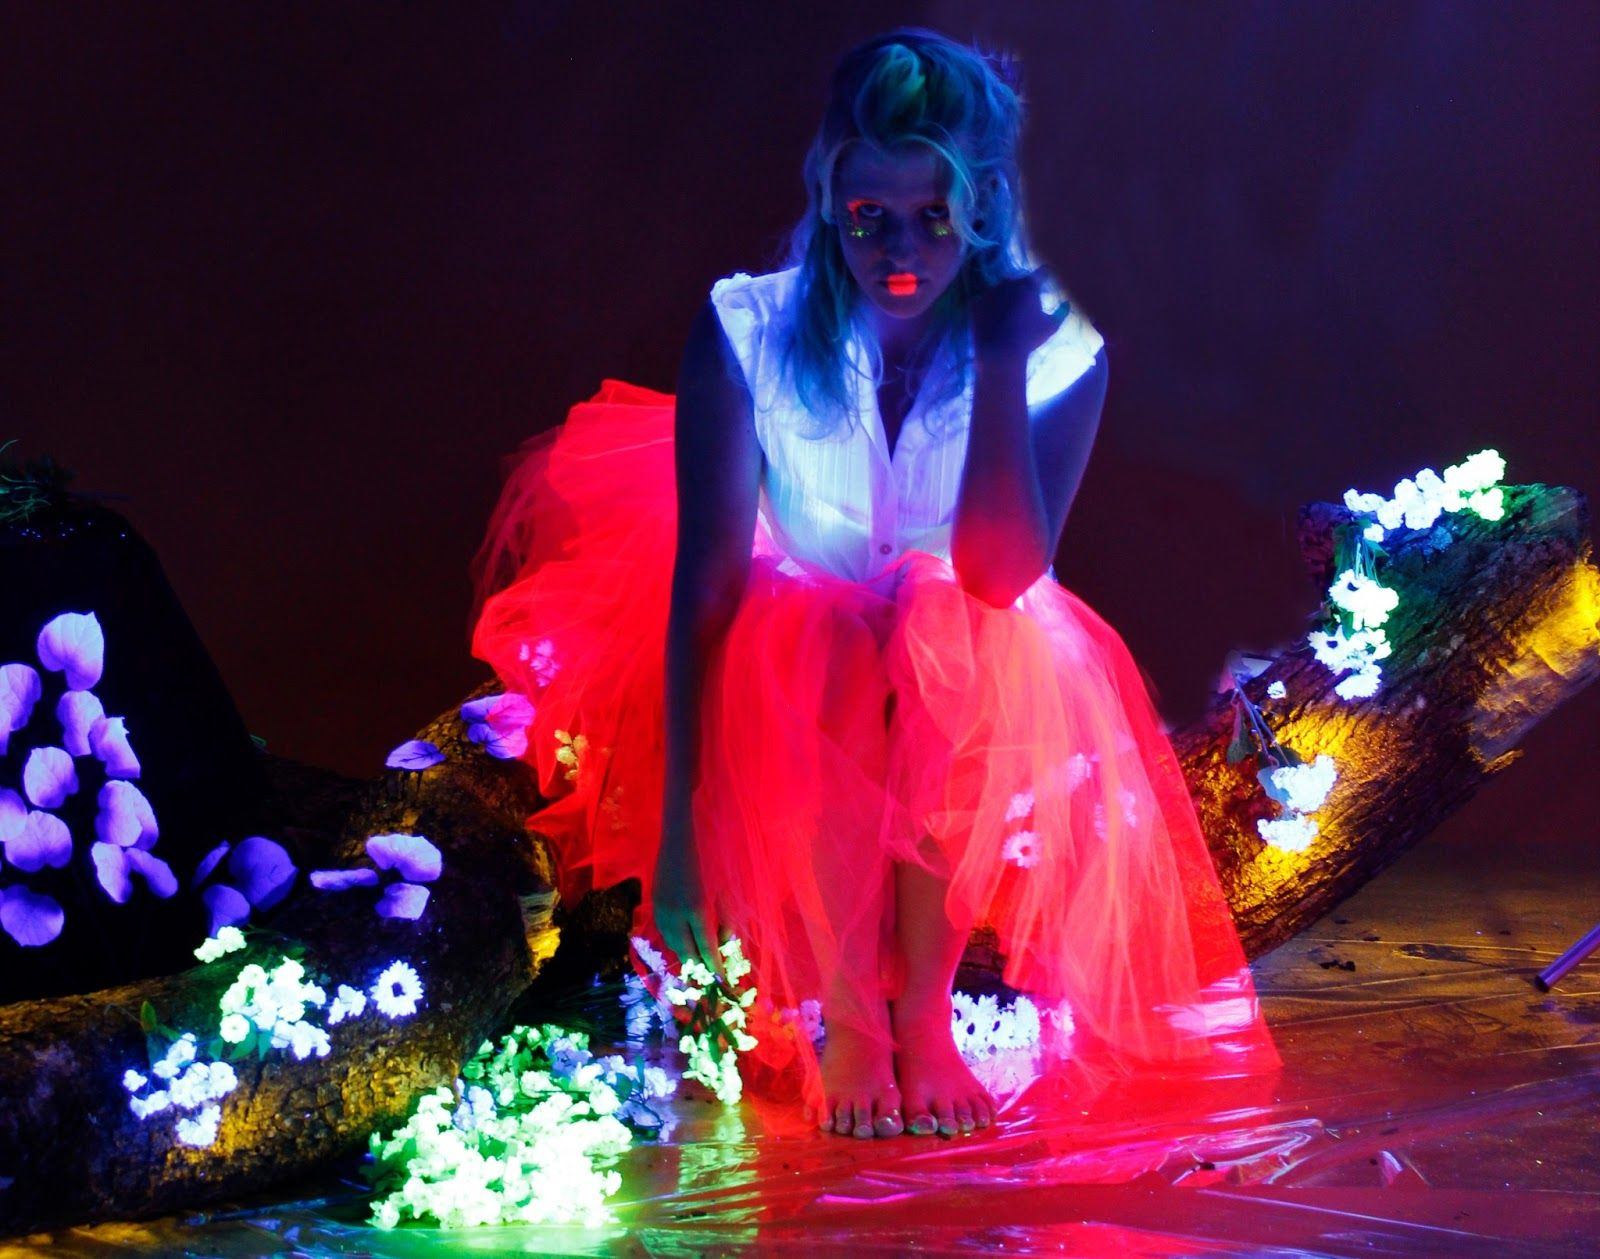 Photos: Camila Tutui Delhaye  Styling: Fabiana Leite e Sulamita Dancuart  Makeup: Sulamita Dancuart  Scenography: Ana Luísa Redda e Sulamita Dancuart  Editing: Equipe  Models: Laura Sarkovas , Lia Paris , Vini Uehara